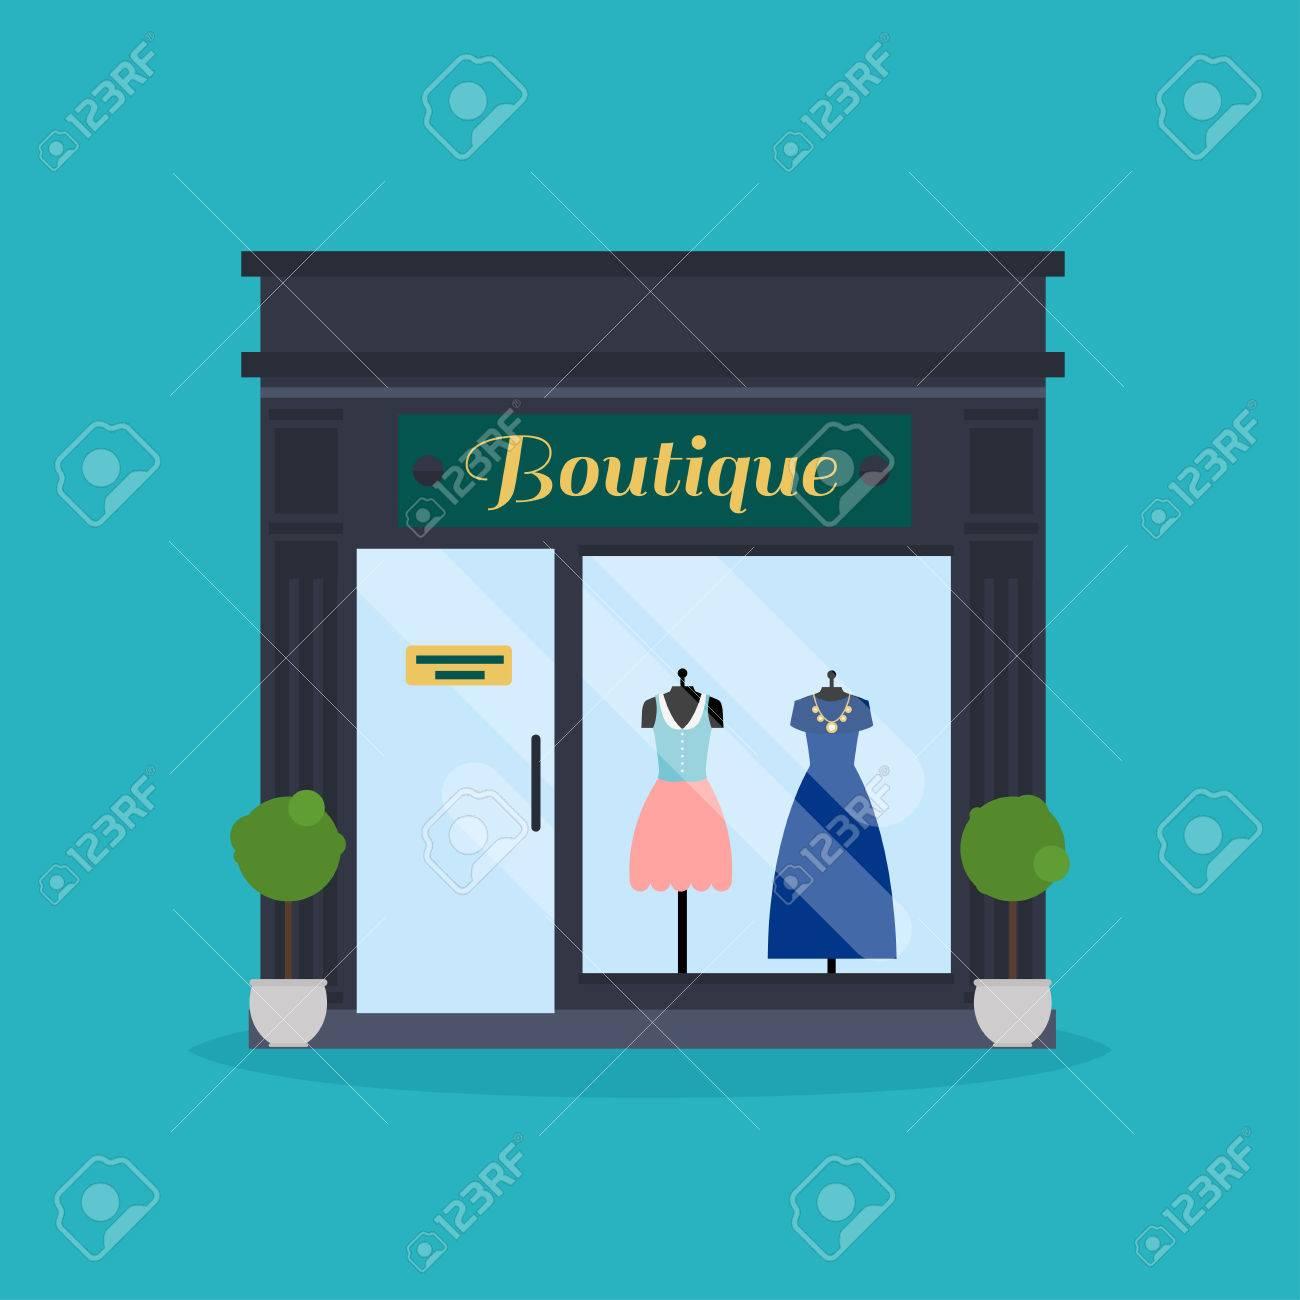 Fashion boutique facade. Clothes shop. Ideal for market business web publications and graphic design. - 51629101